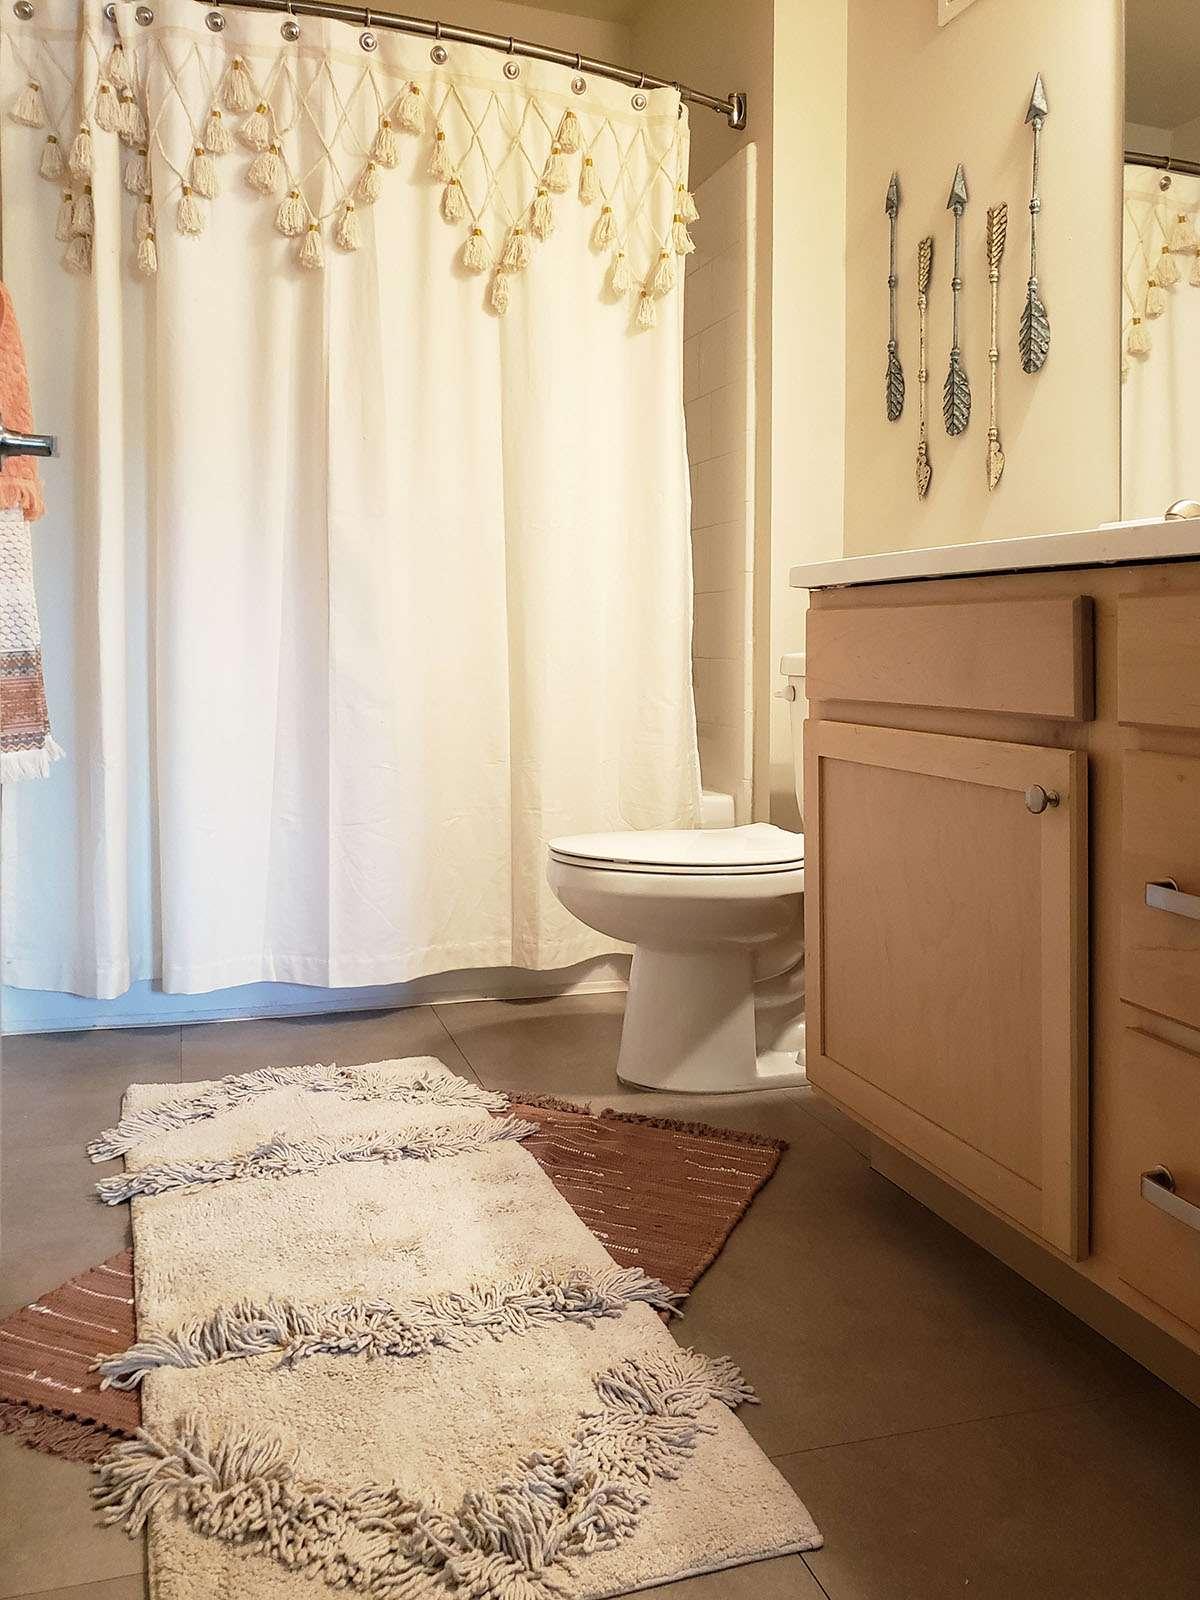 Bathroom IMG 1